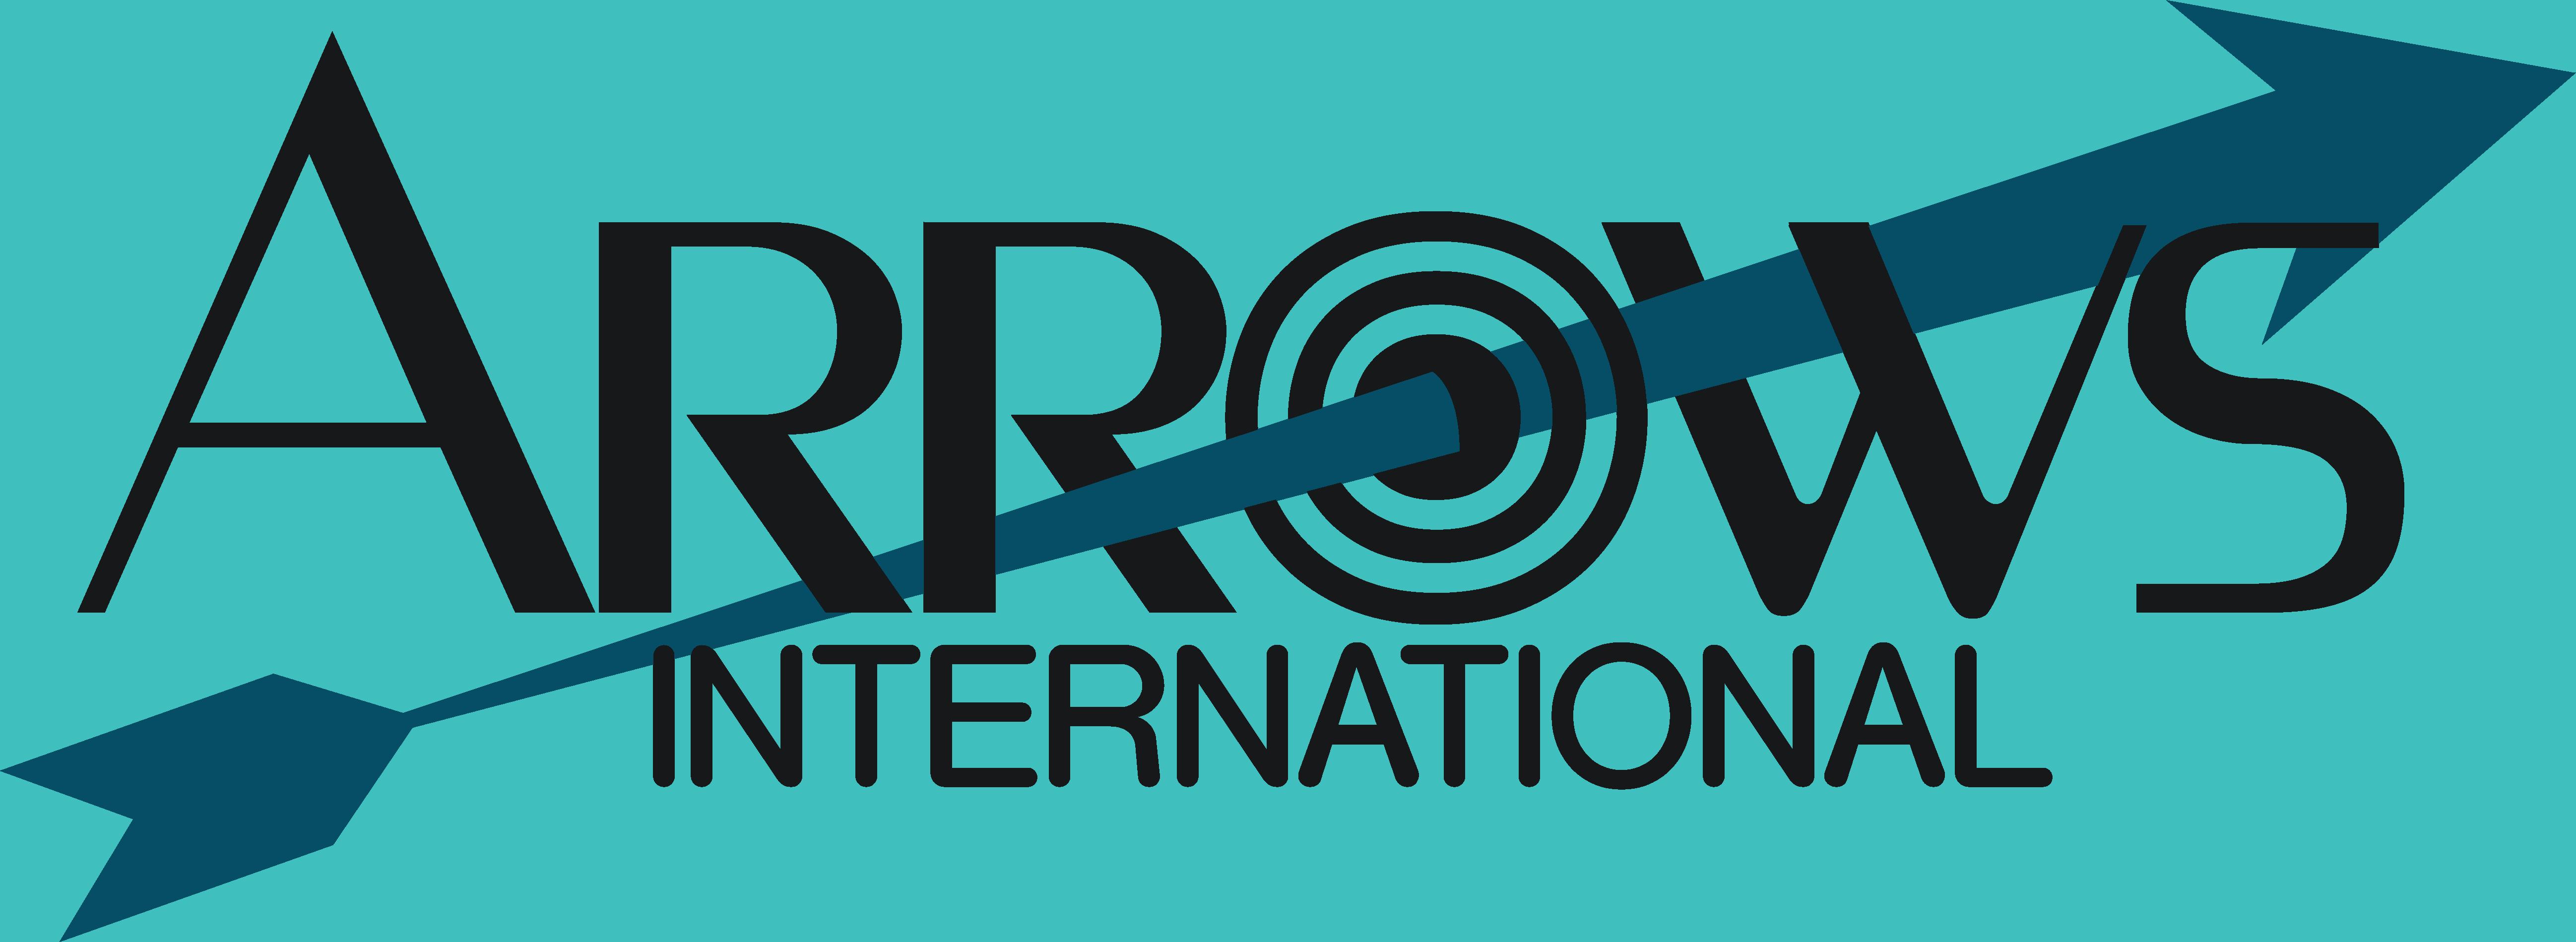 Arrows International